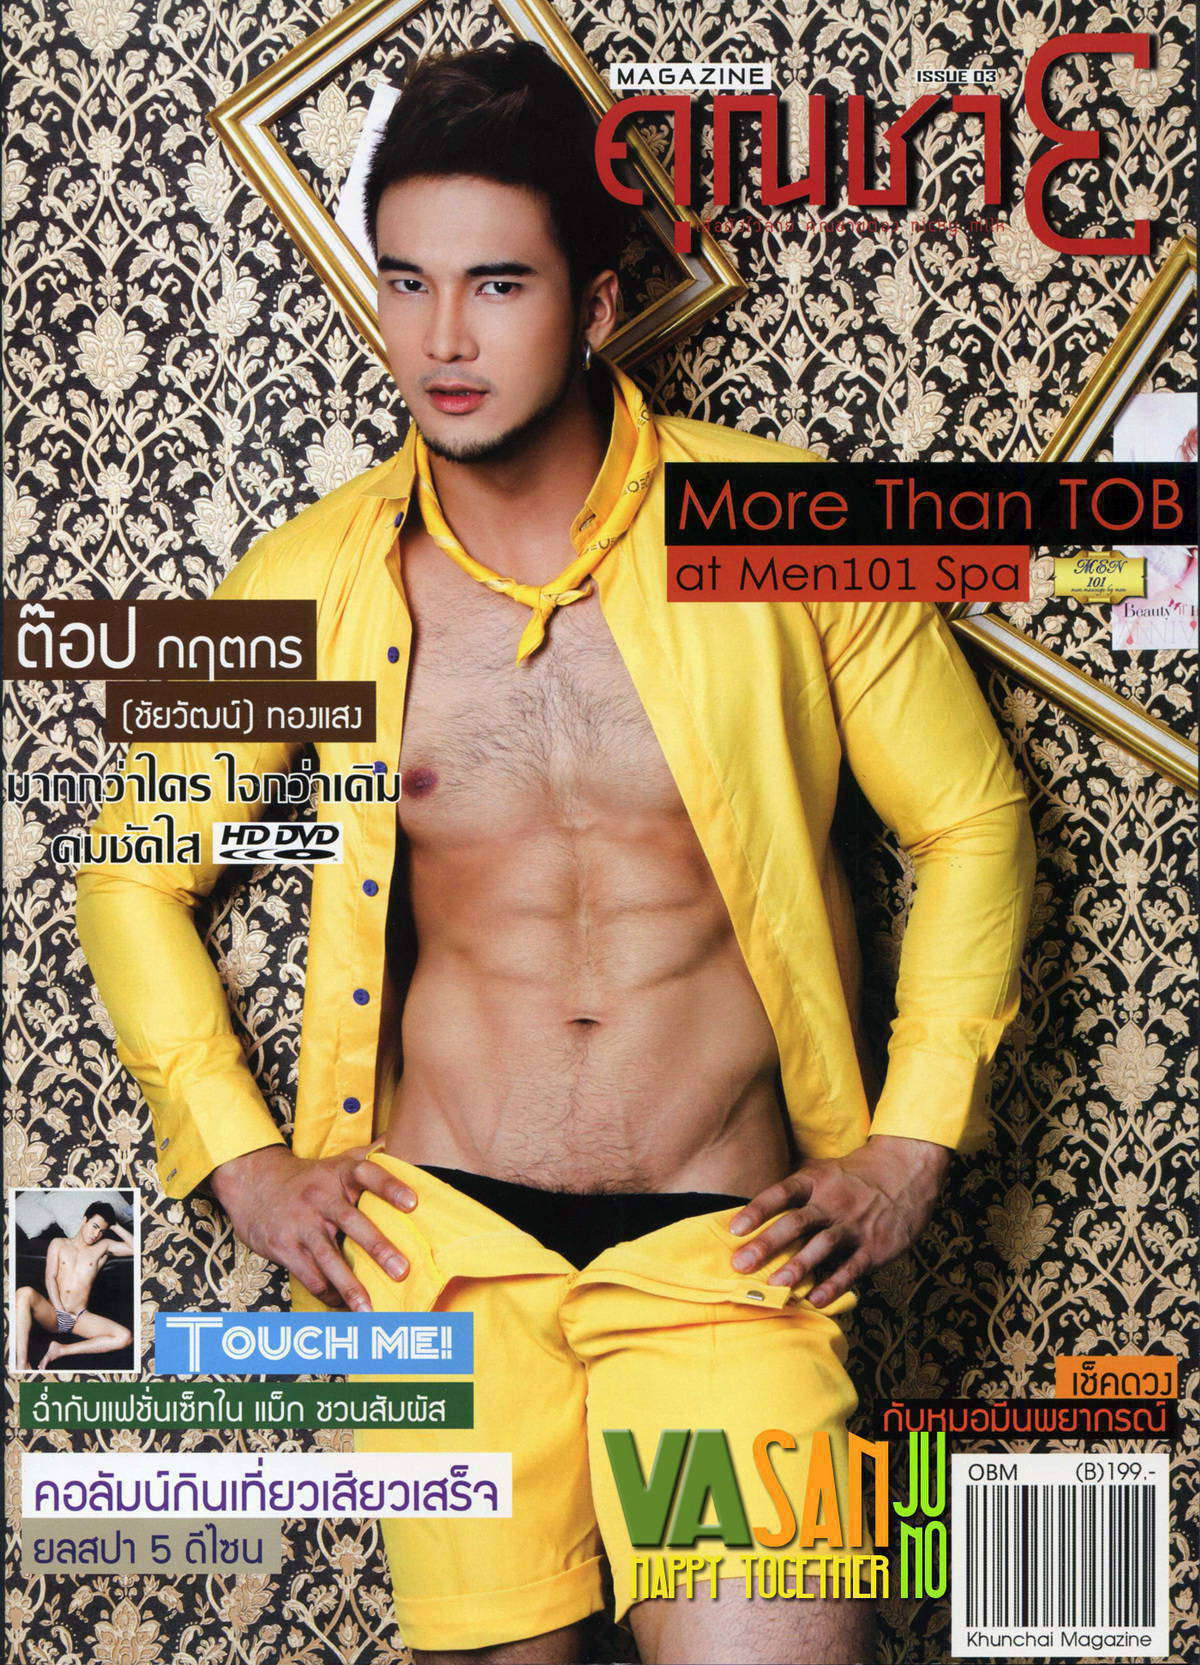 Khun Chai นิตยสารฉบับ 03 Tob & Mac Touch Me (คุณชายแมกกาซีนเล่ม 3)